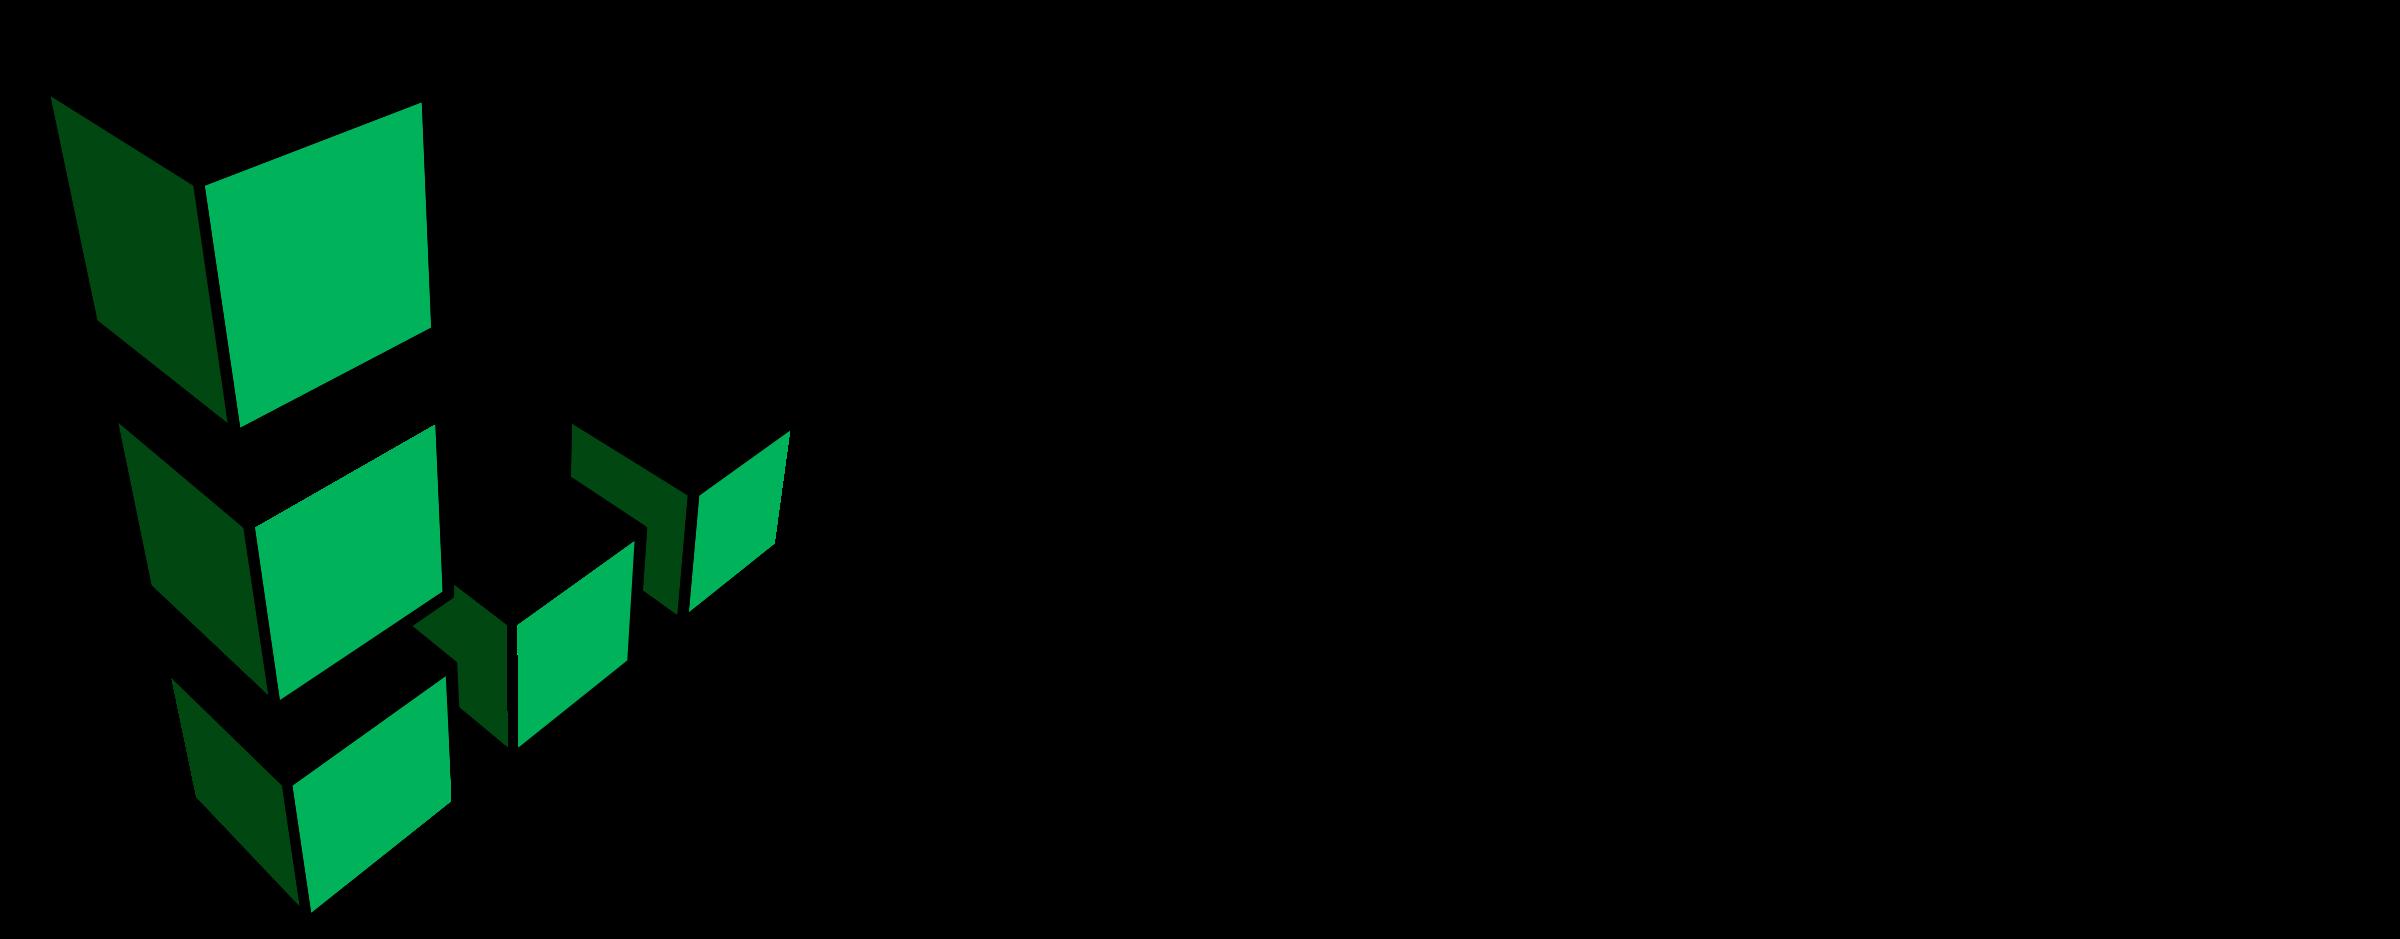 linode-logo-png-transparent